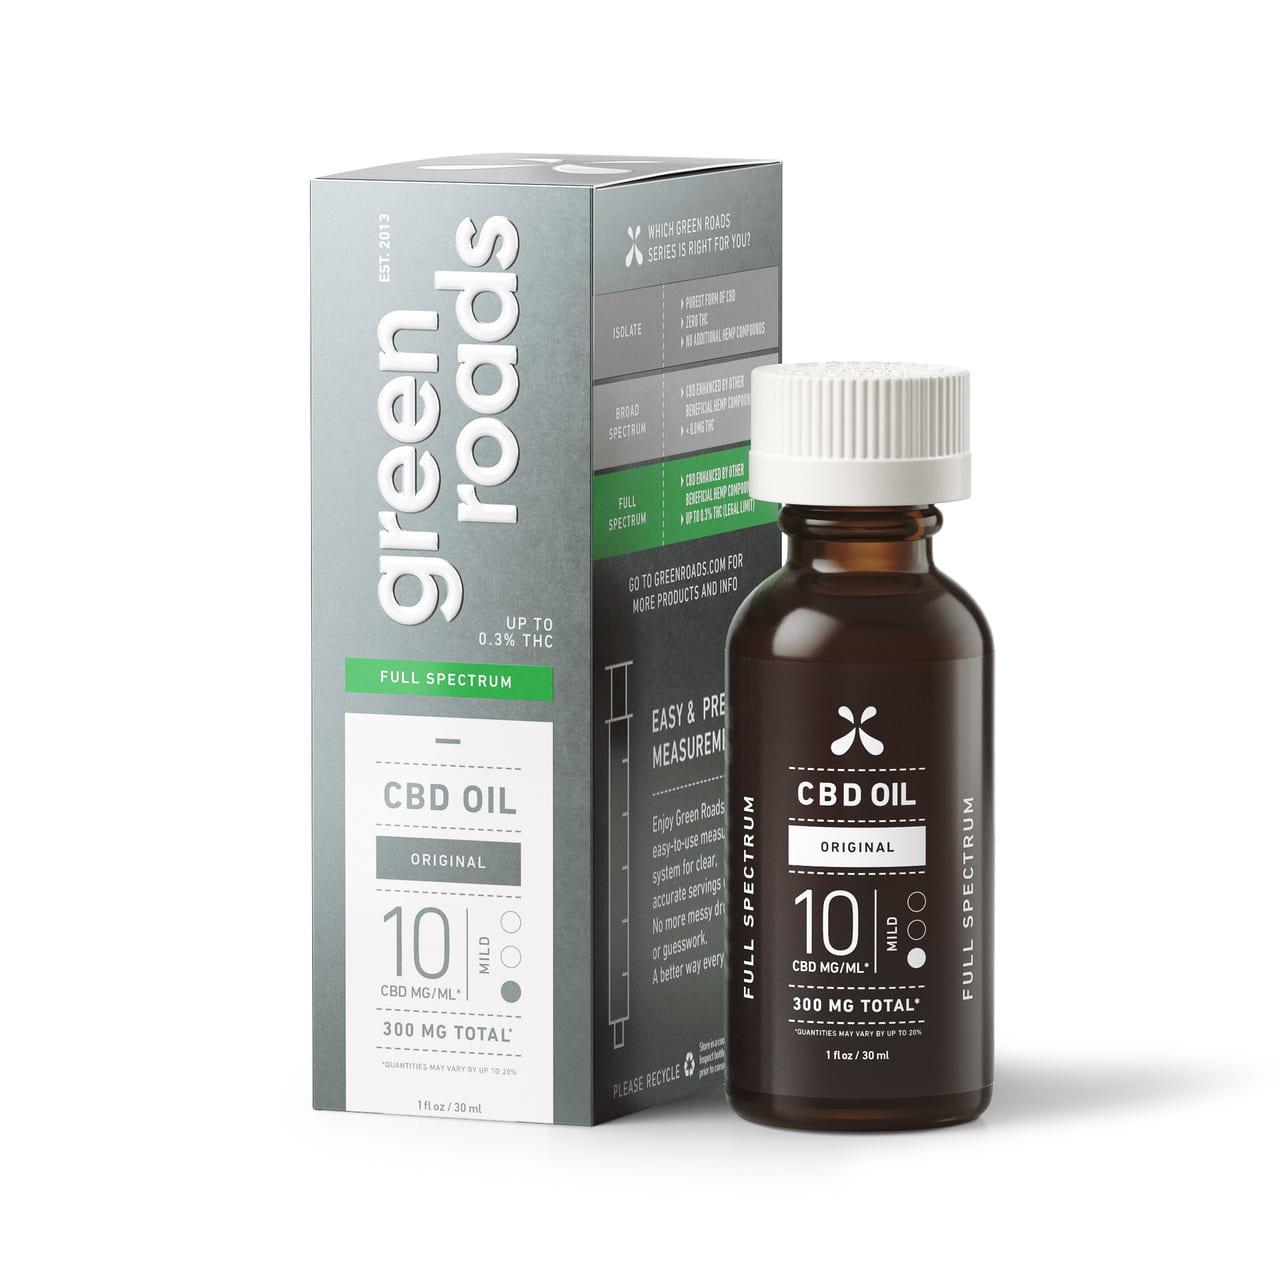 Green Roads, CBD Oil, Full Spectrum, Natural Flavor, 1oz, 10MG_ML, 300mg of CBD